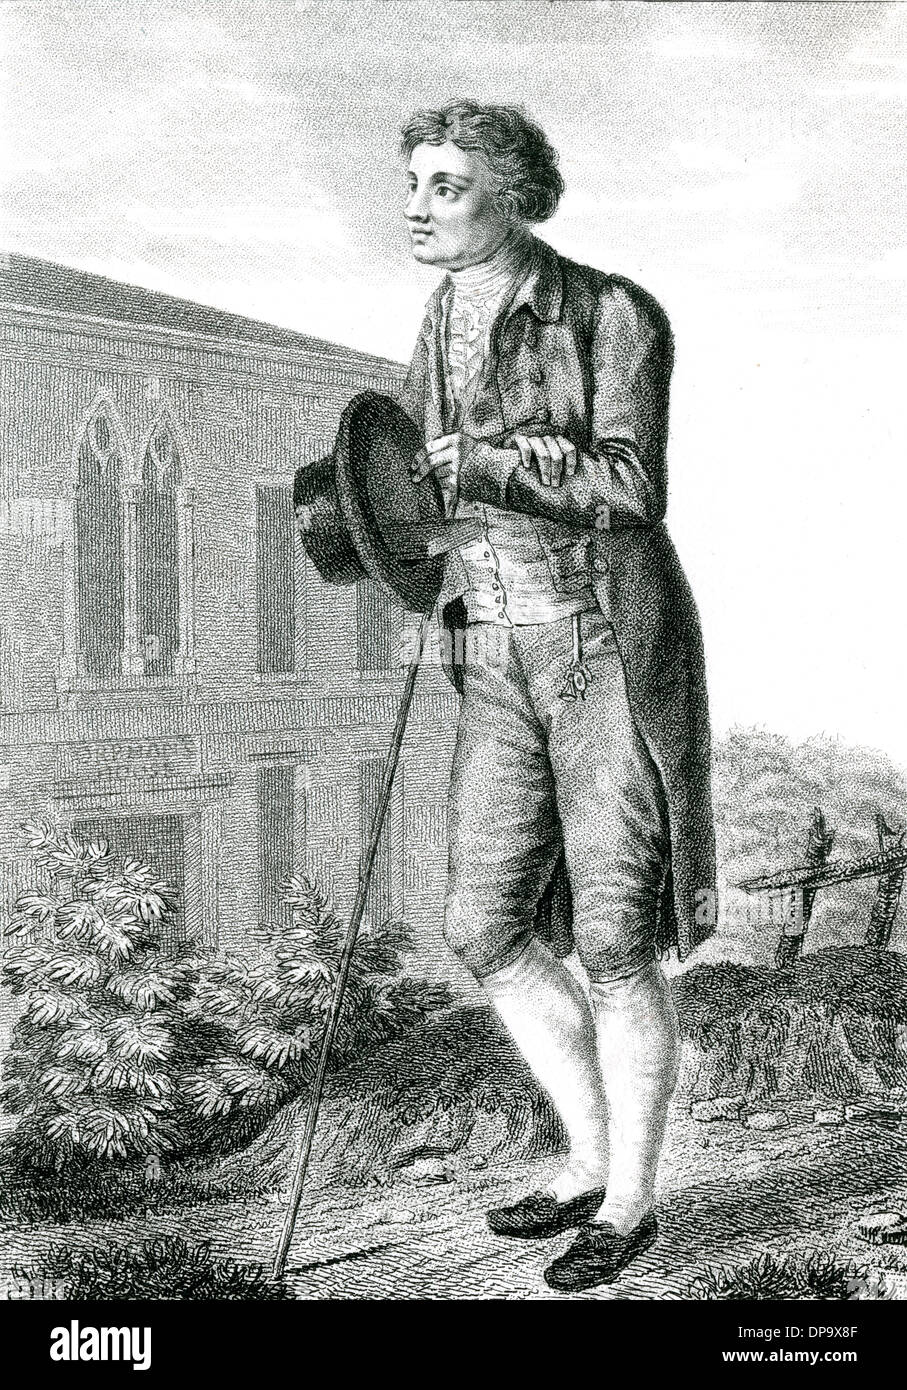 EDMUND BURKE (MARCEAU) - Stock Image